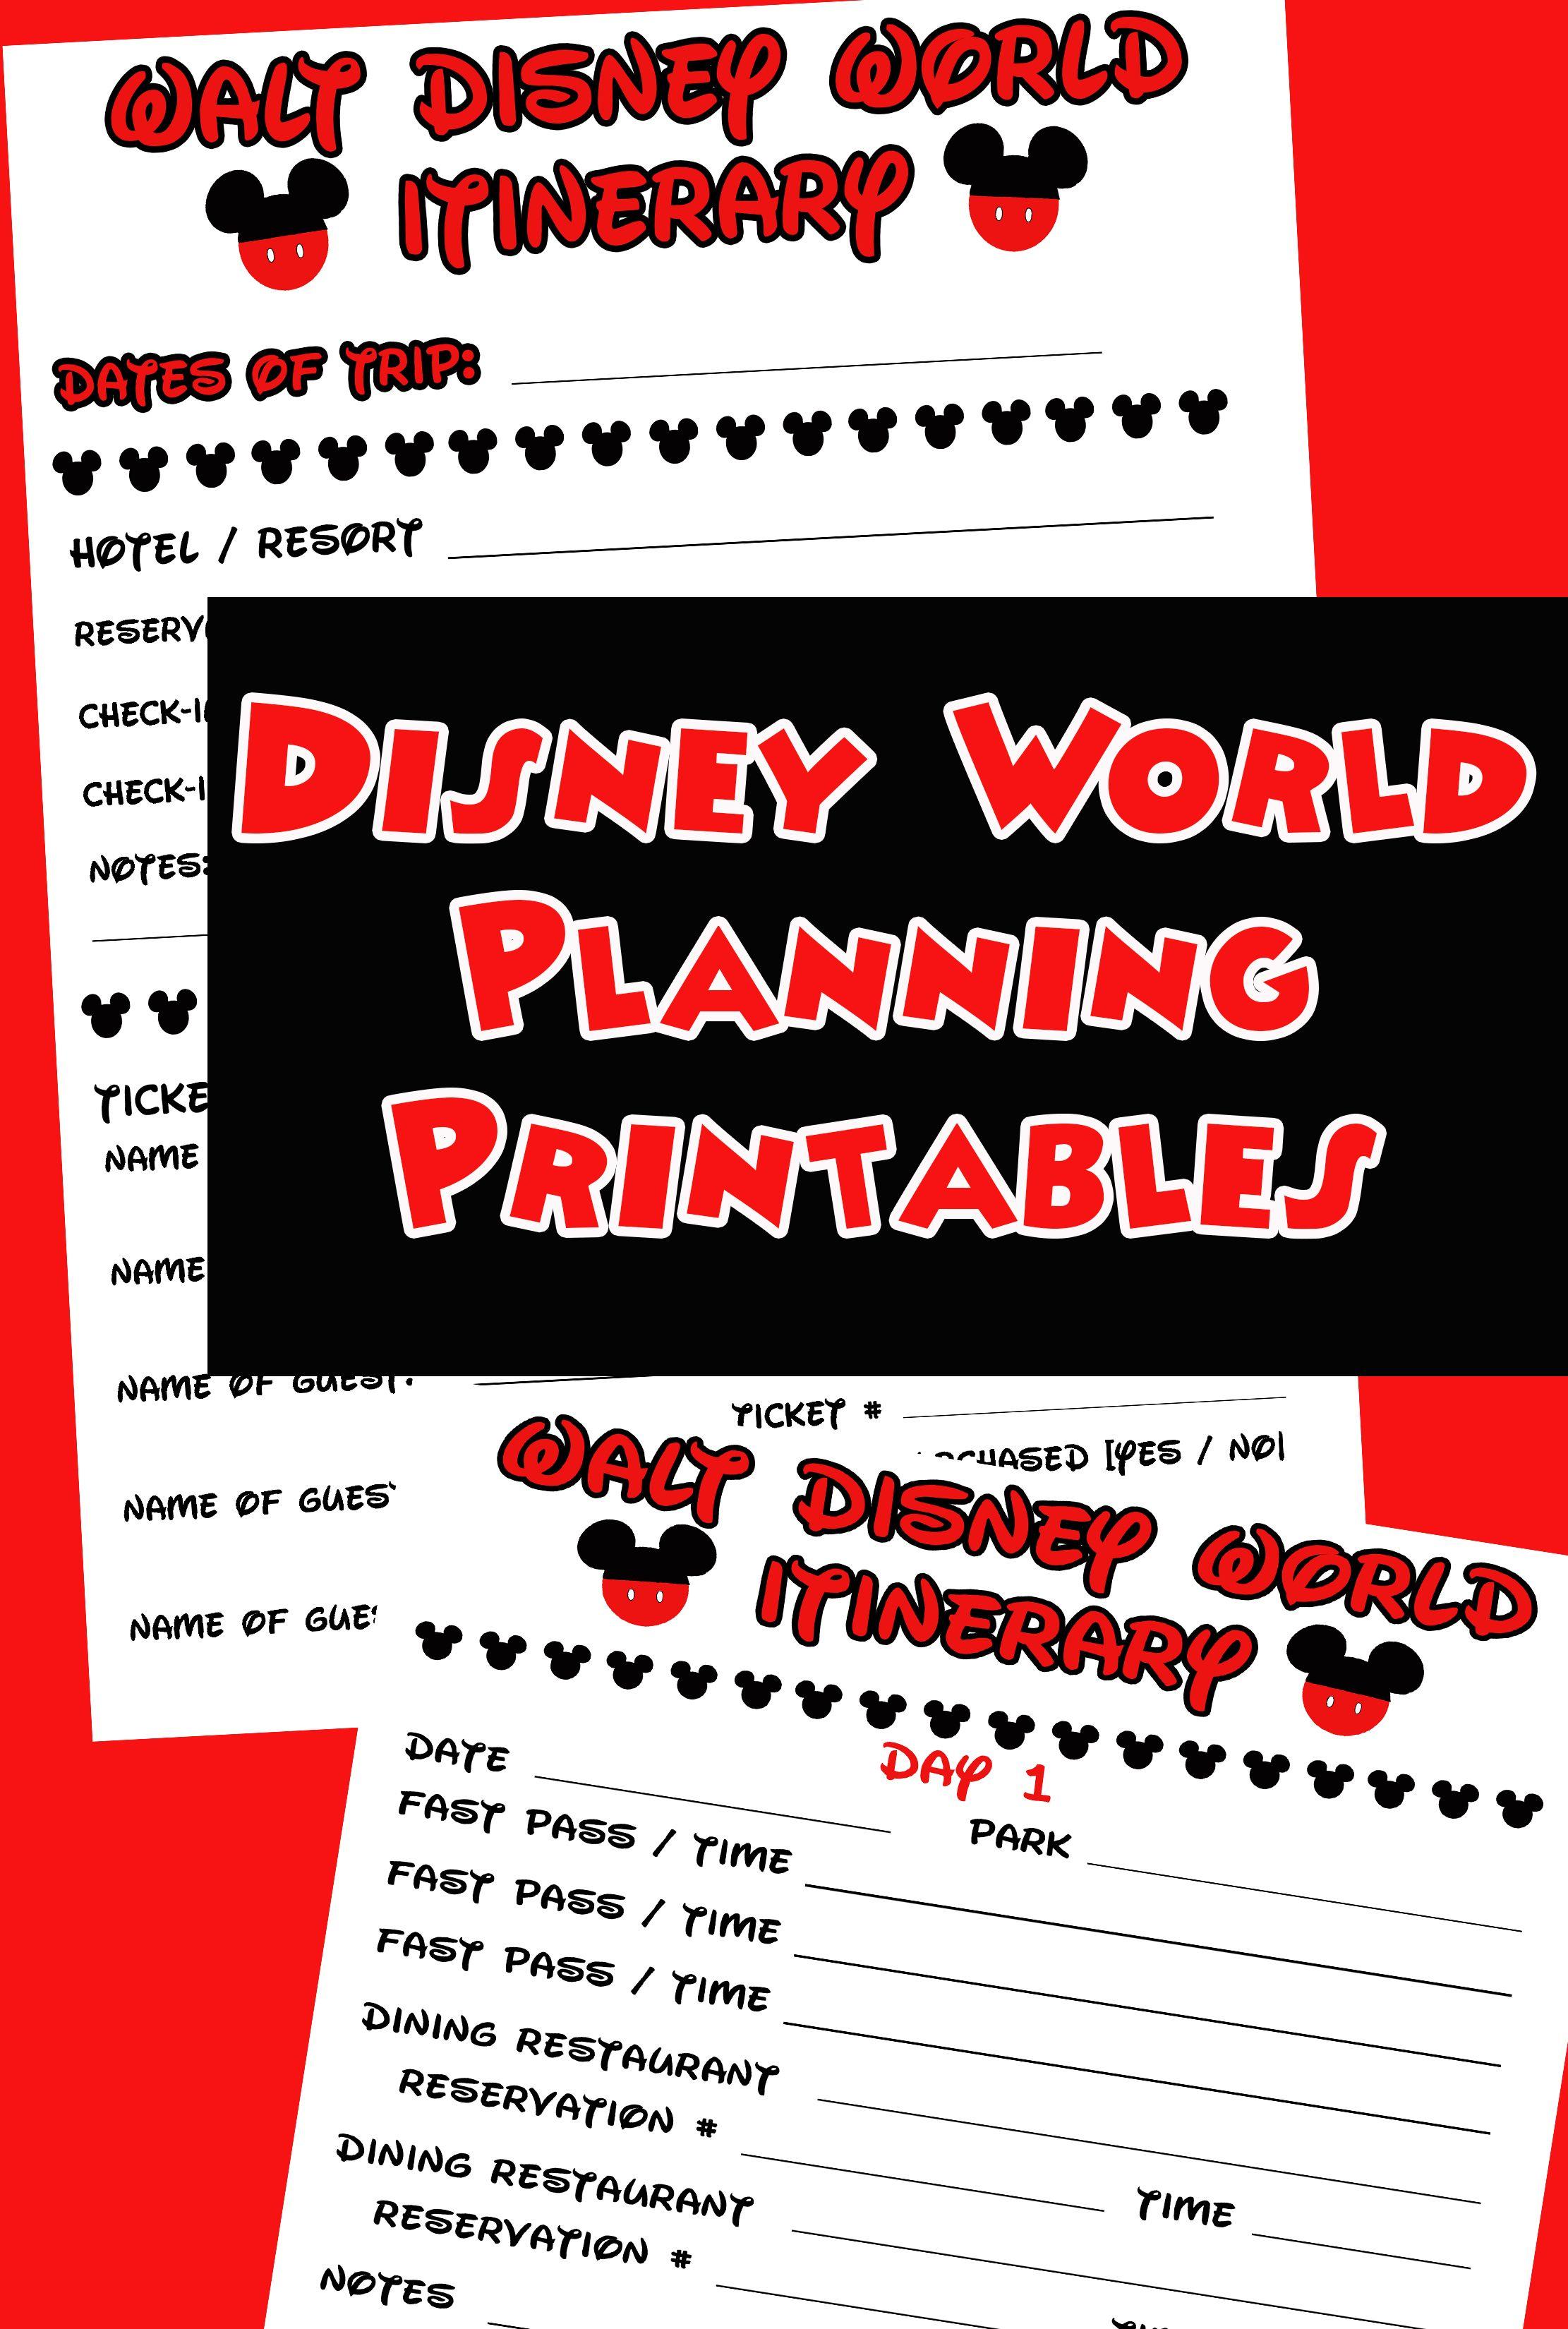 disney agenda  u0026 itinerary free printable